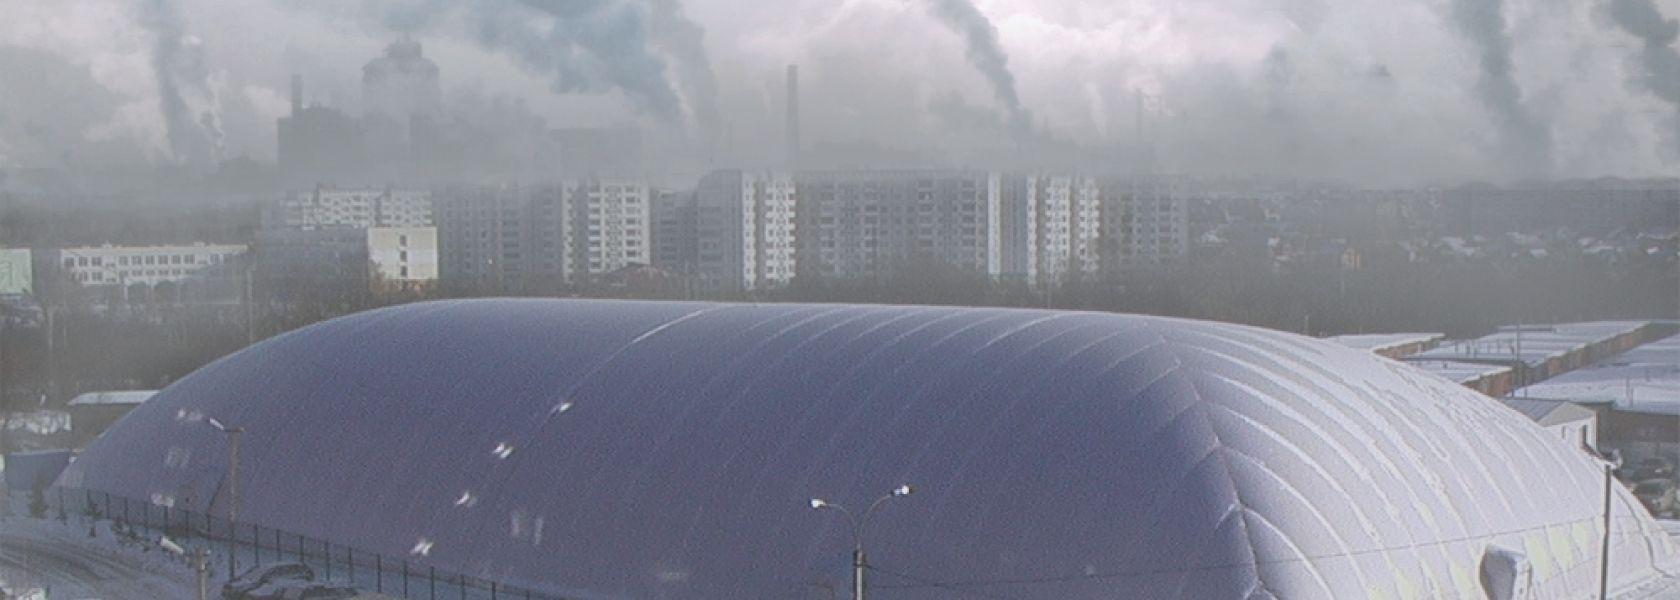 Anti-pollution domes